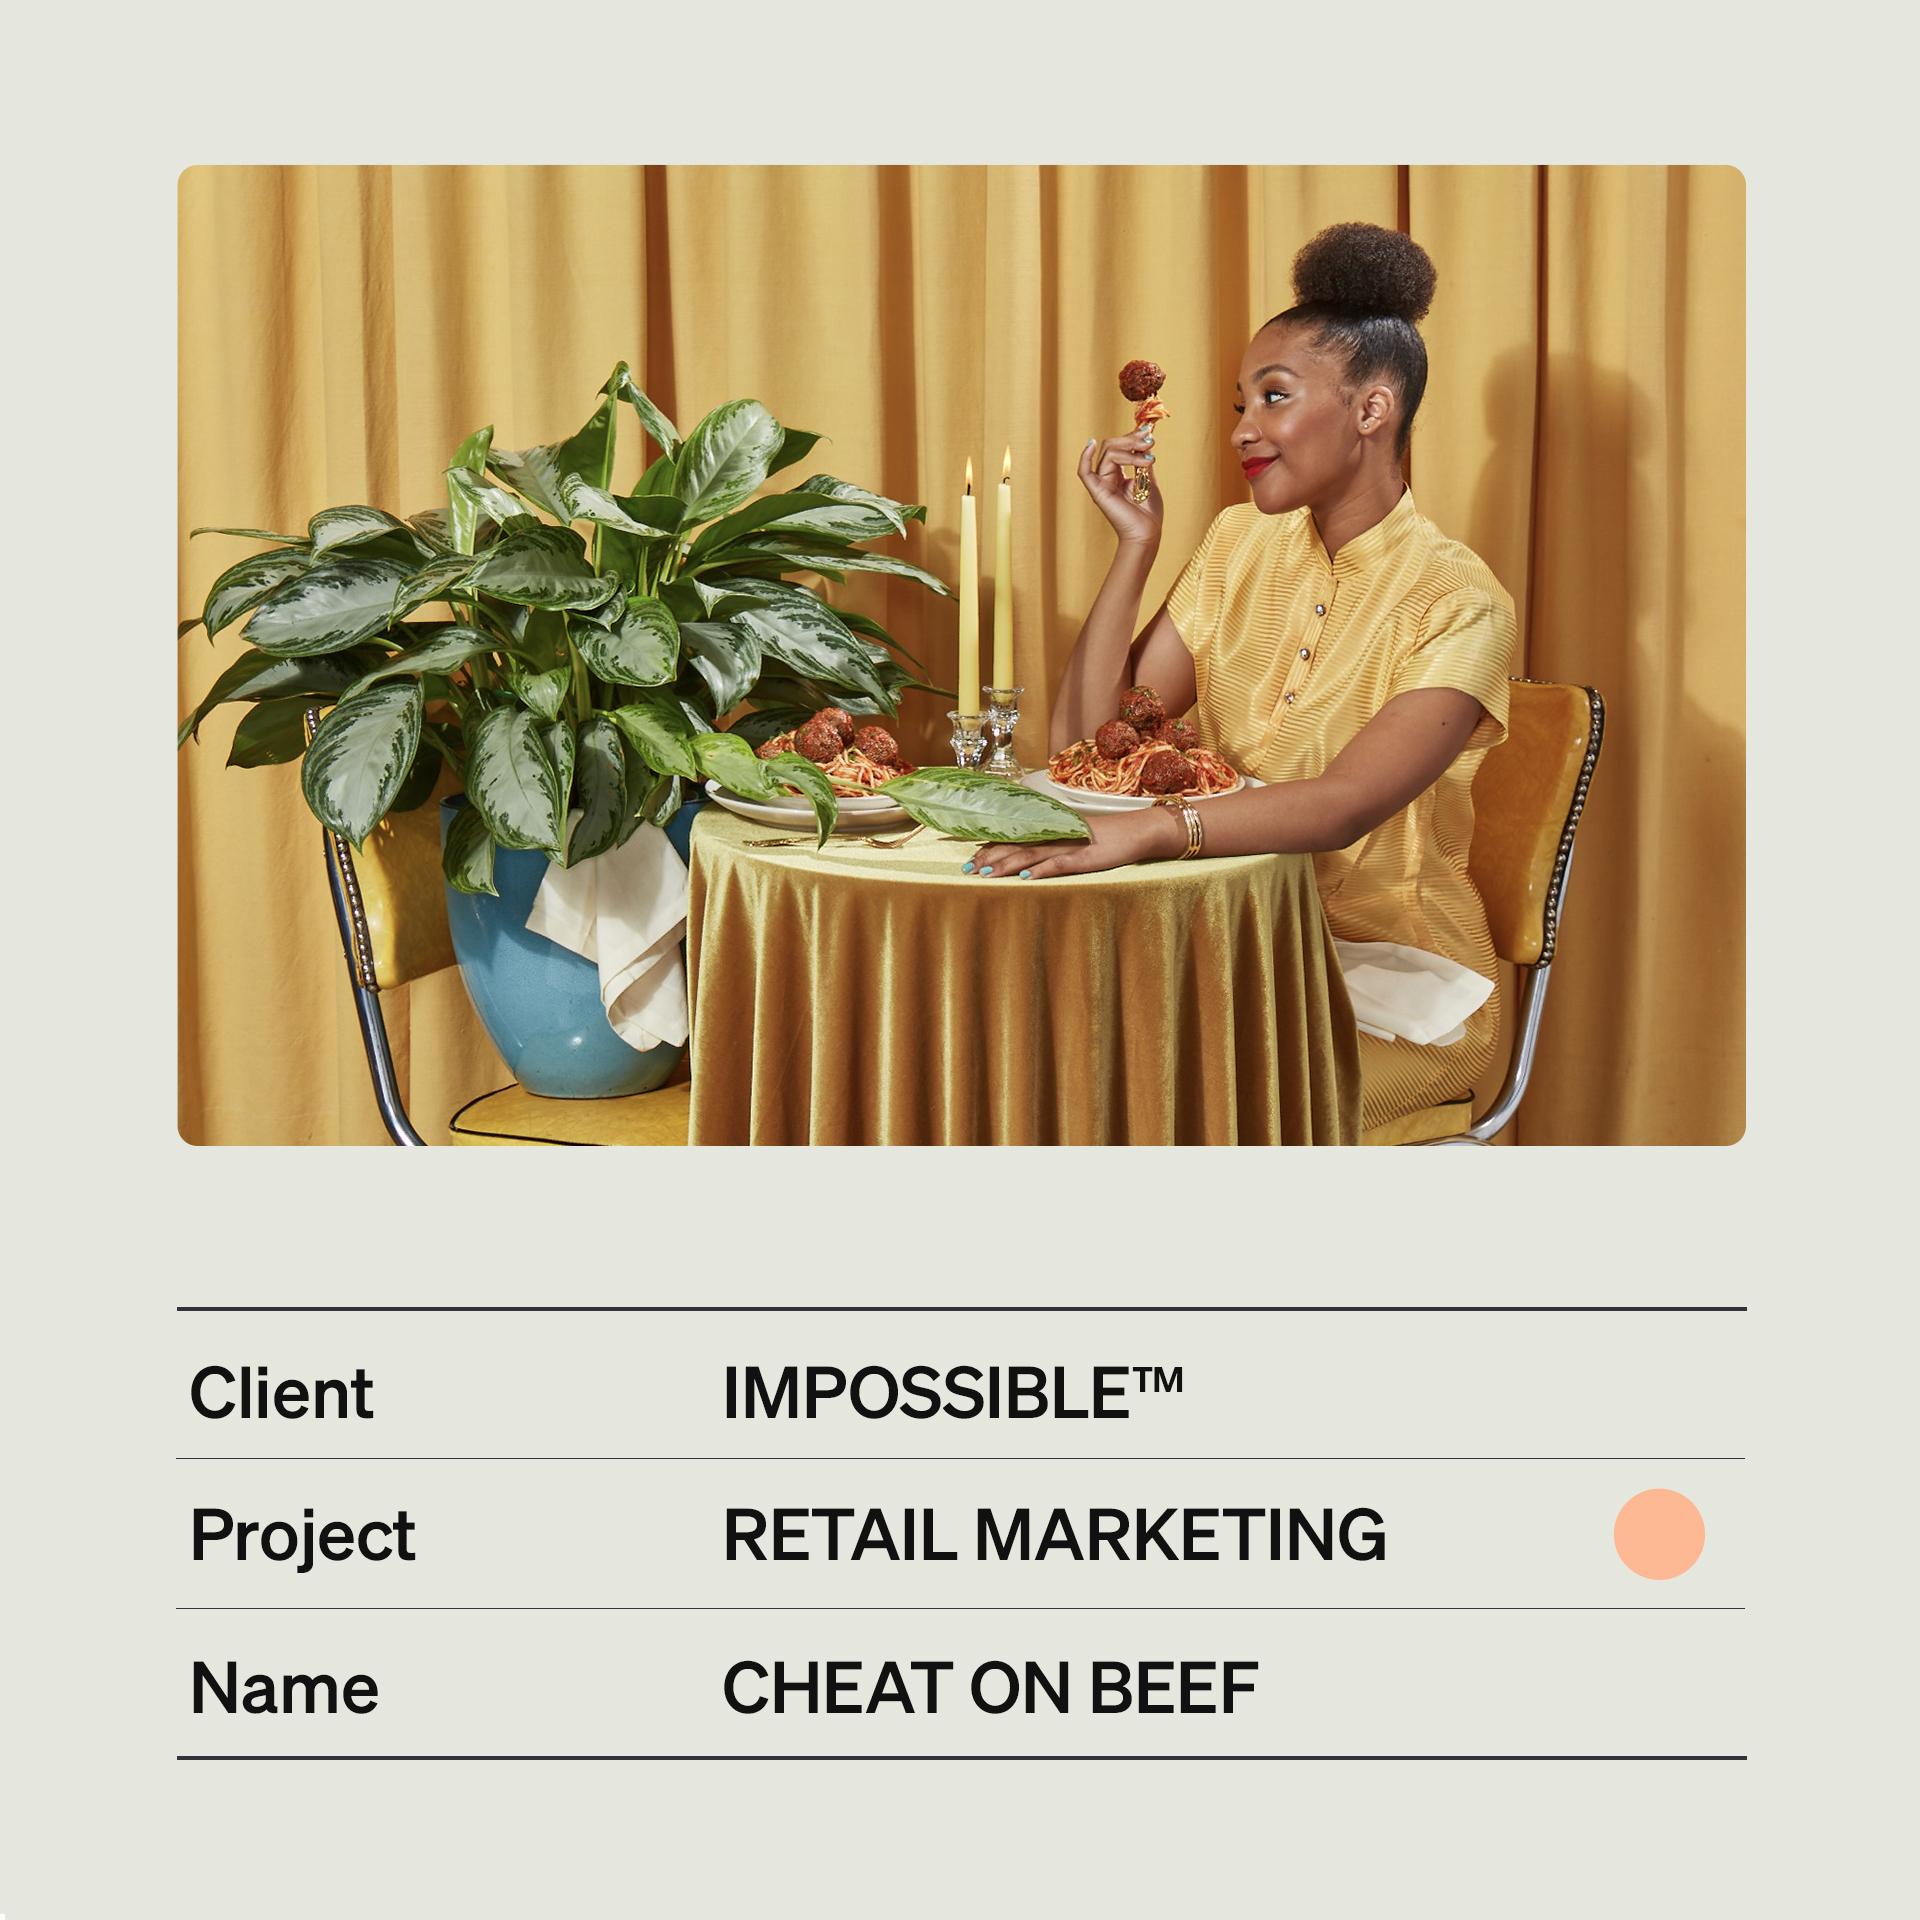 Cheat on Beef